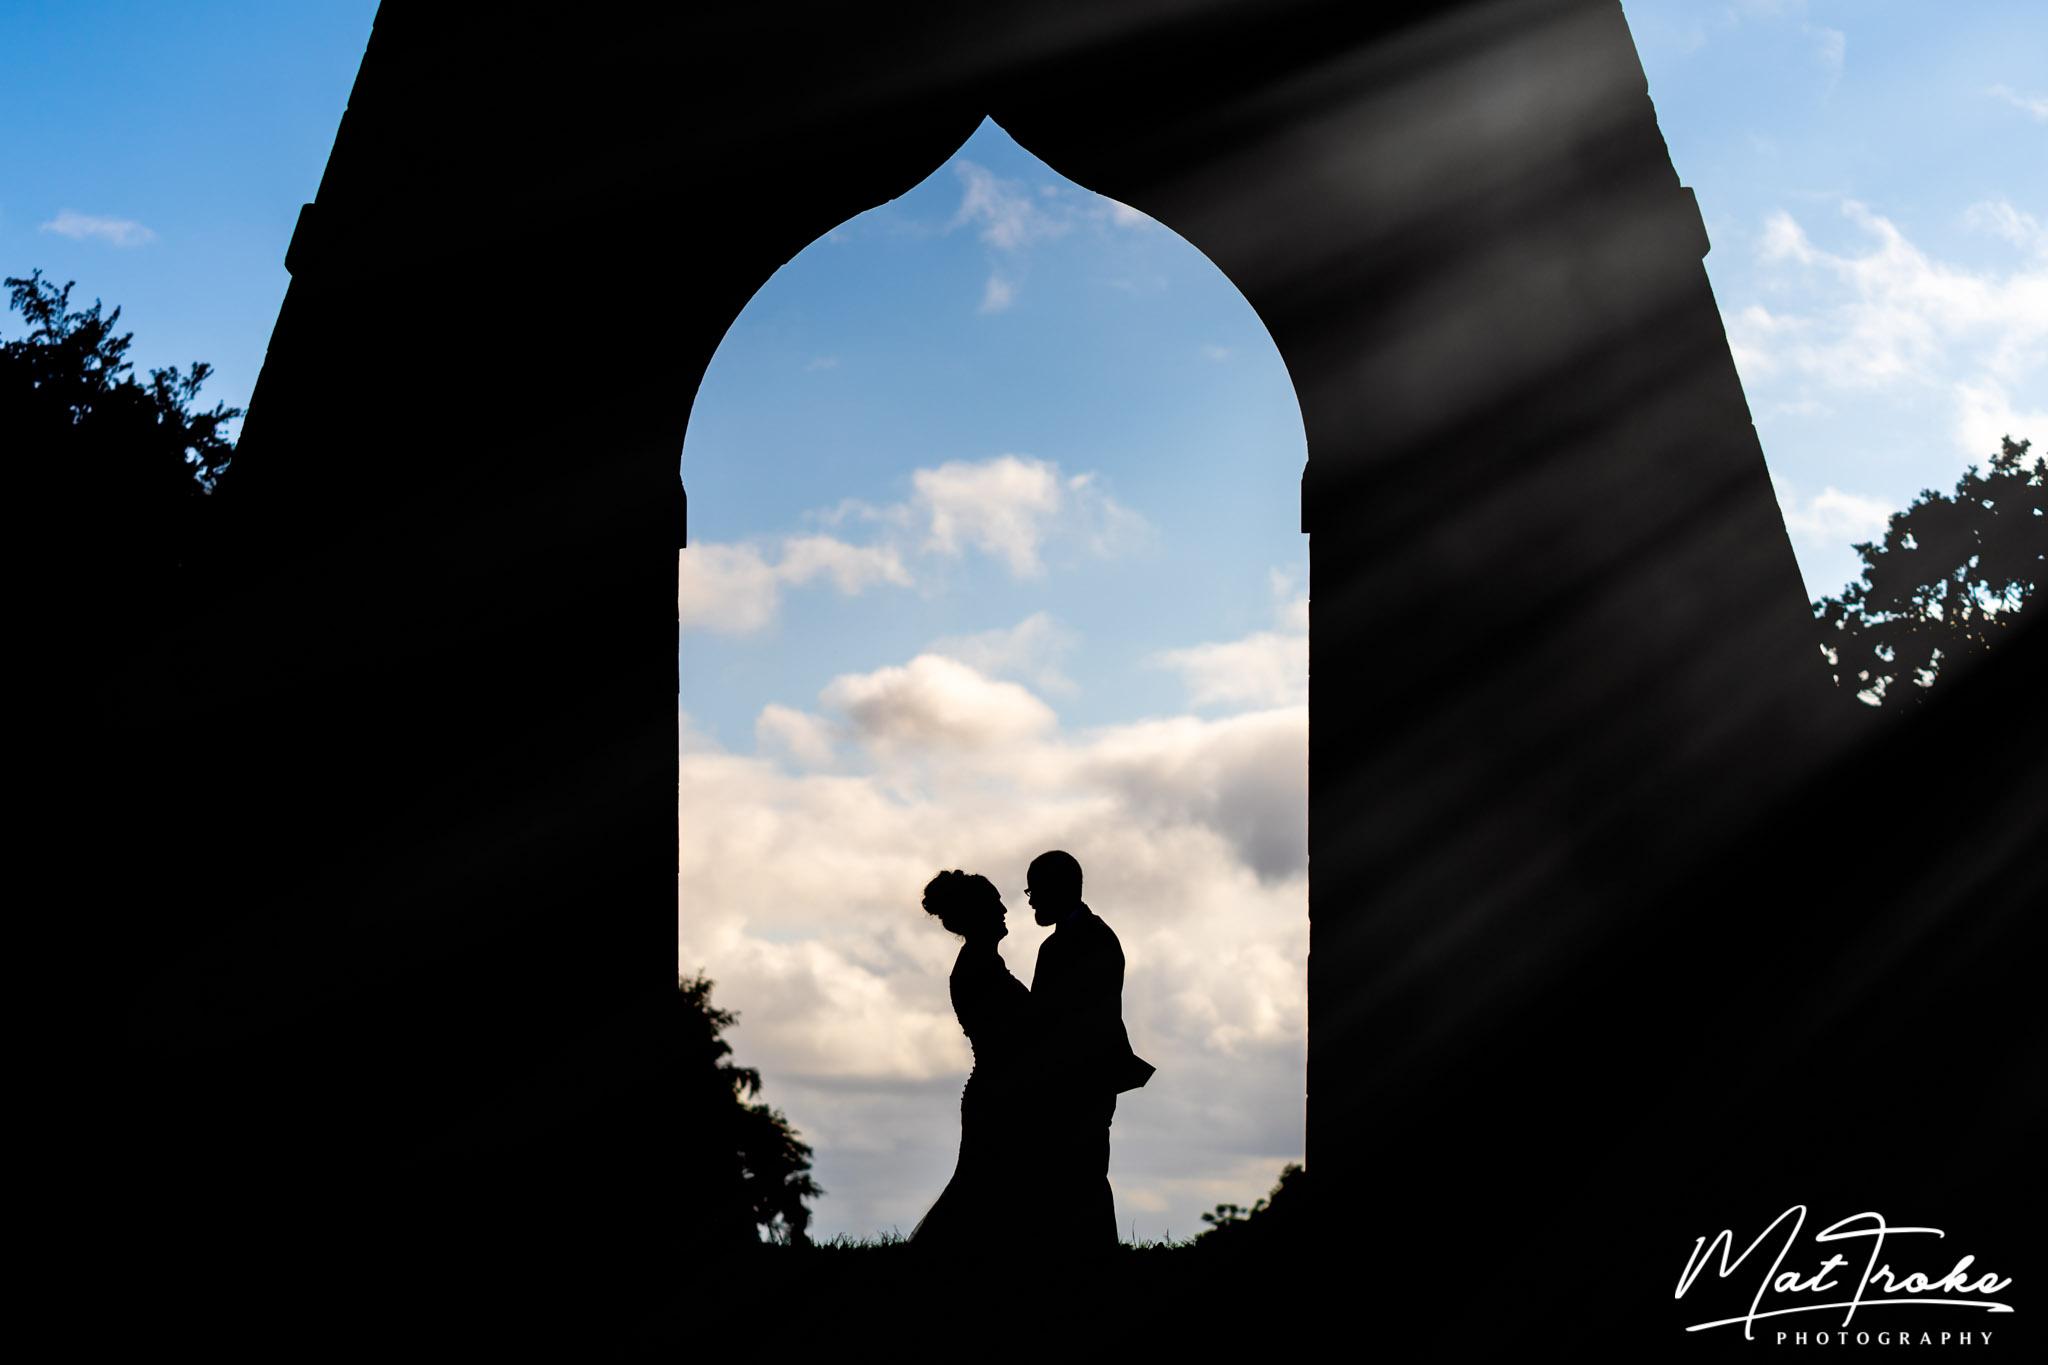 south_yorkshire_wentworth_rotherham_sheffield_church_family_photography_near_stunning_photographer_wedding_summer